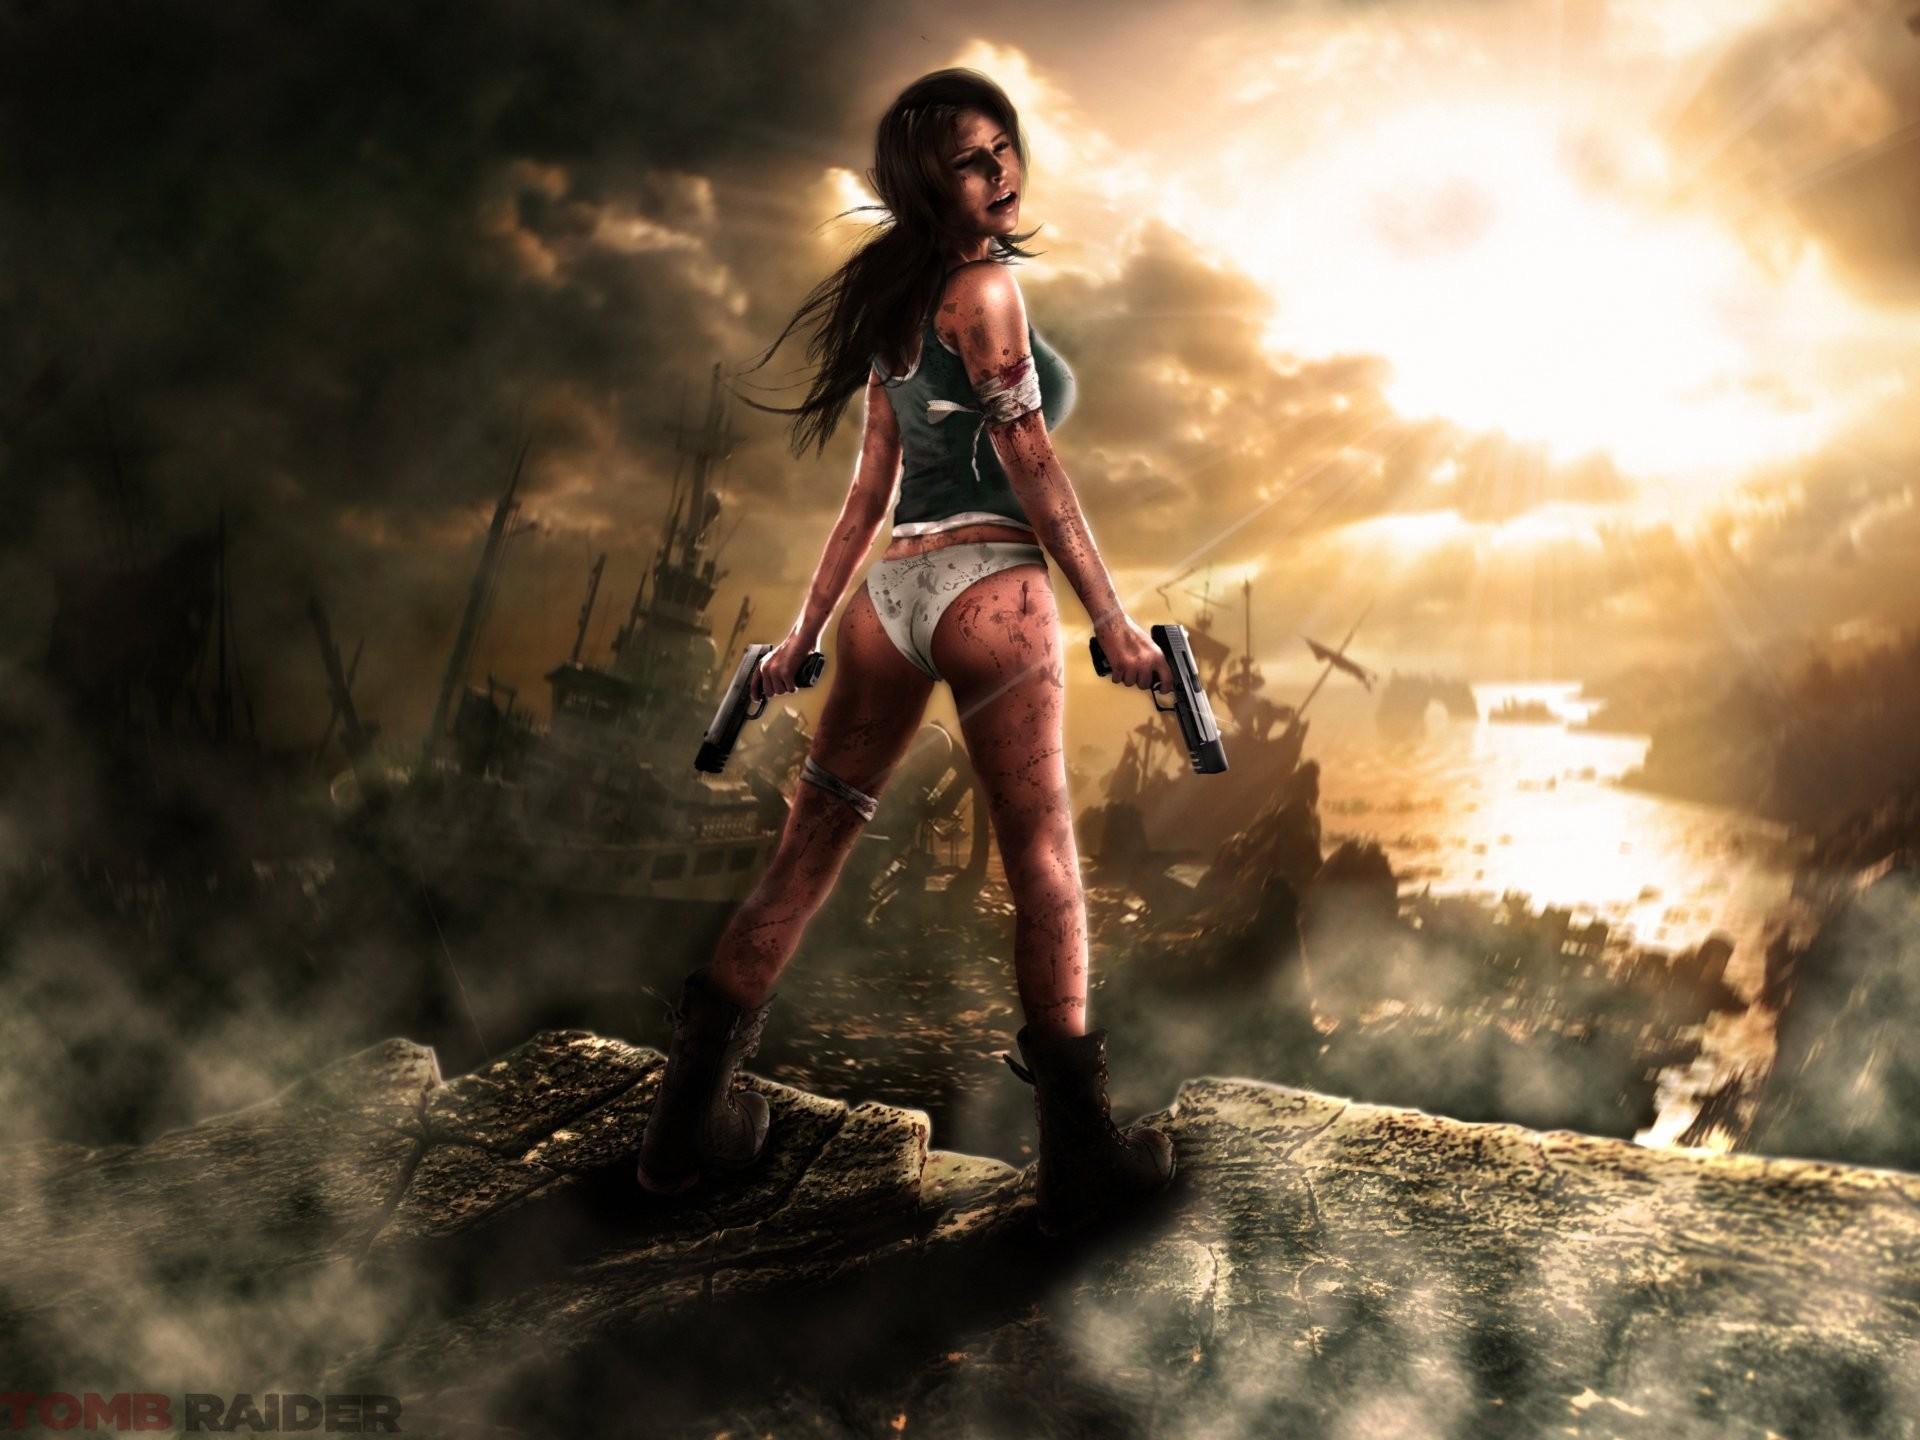 tomb raider lara croft girl guns dressings blood stones ships clouds rays